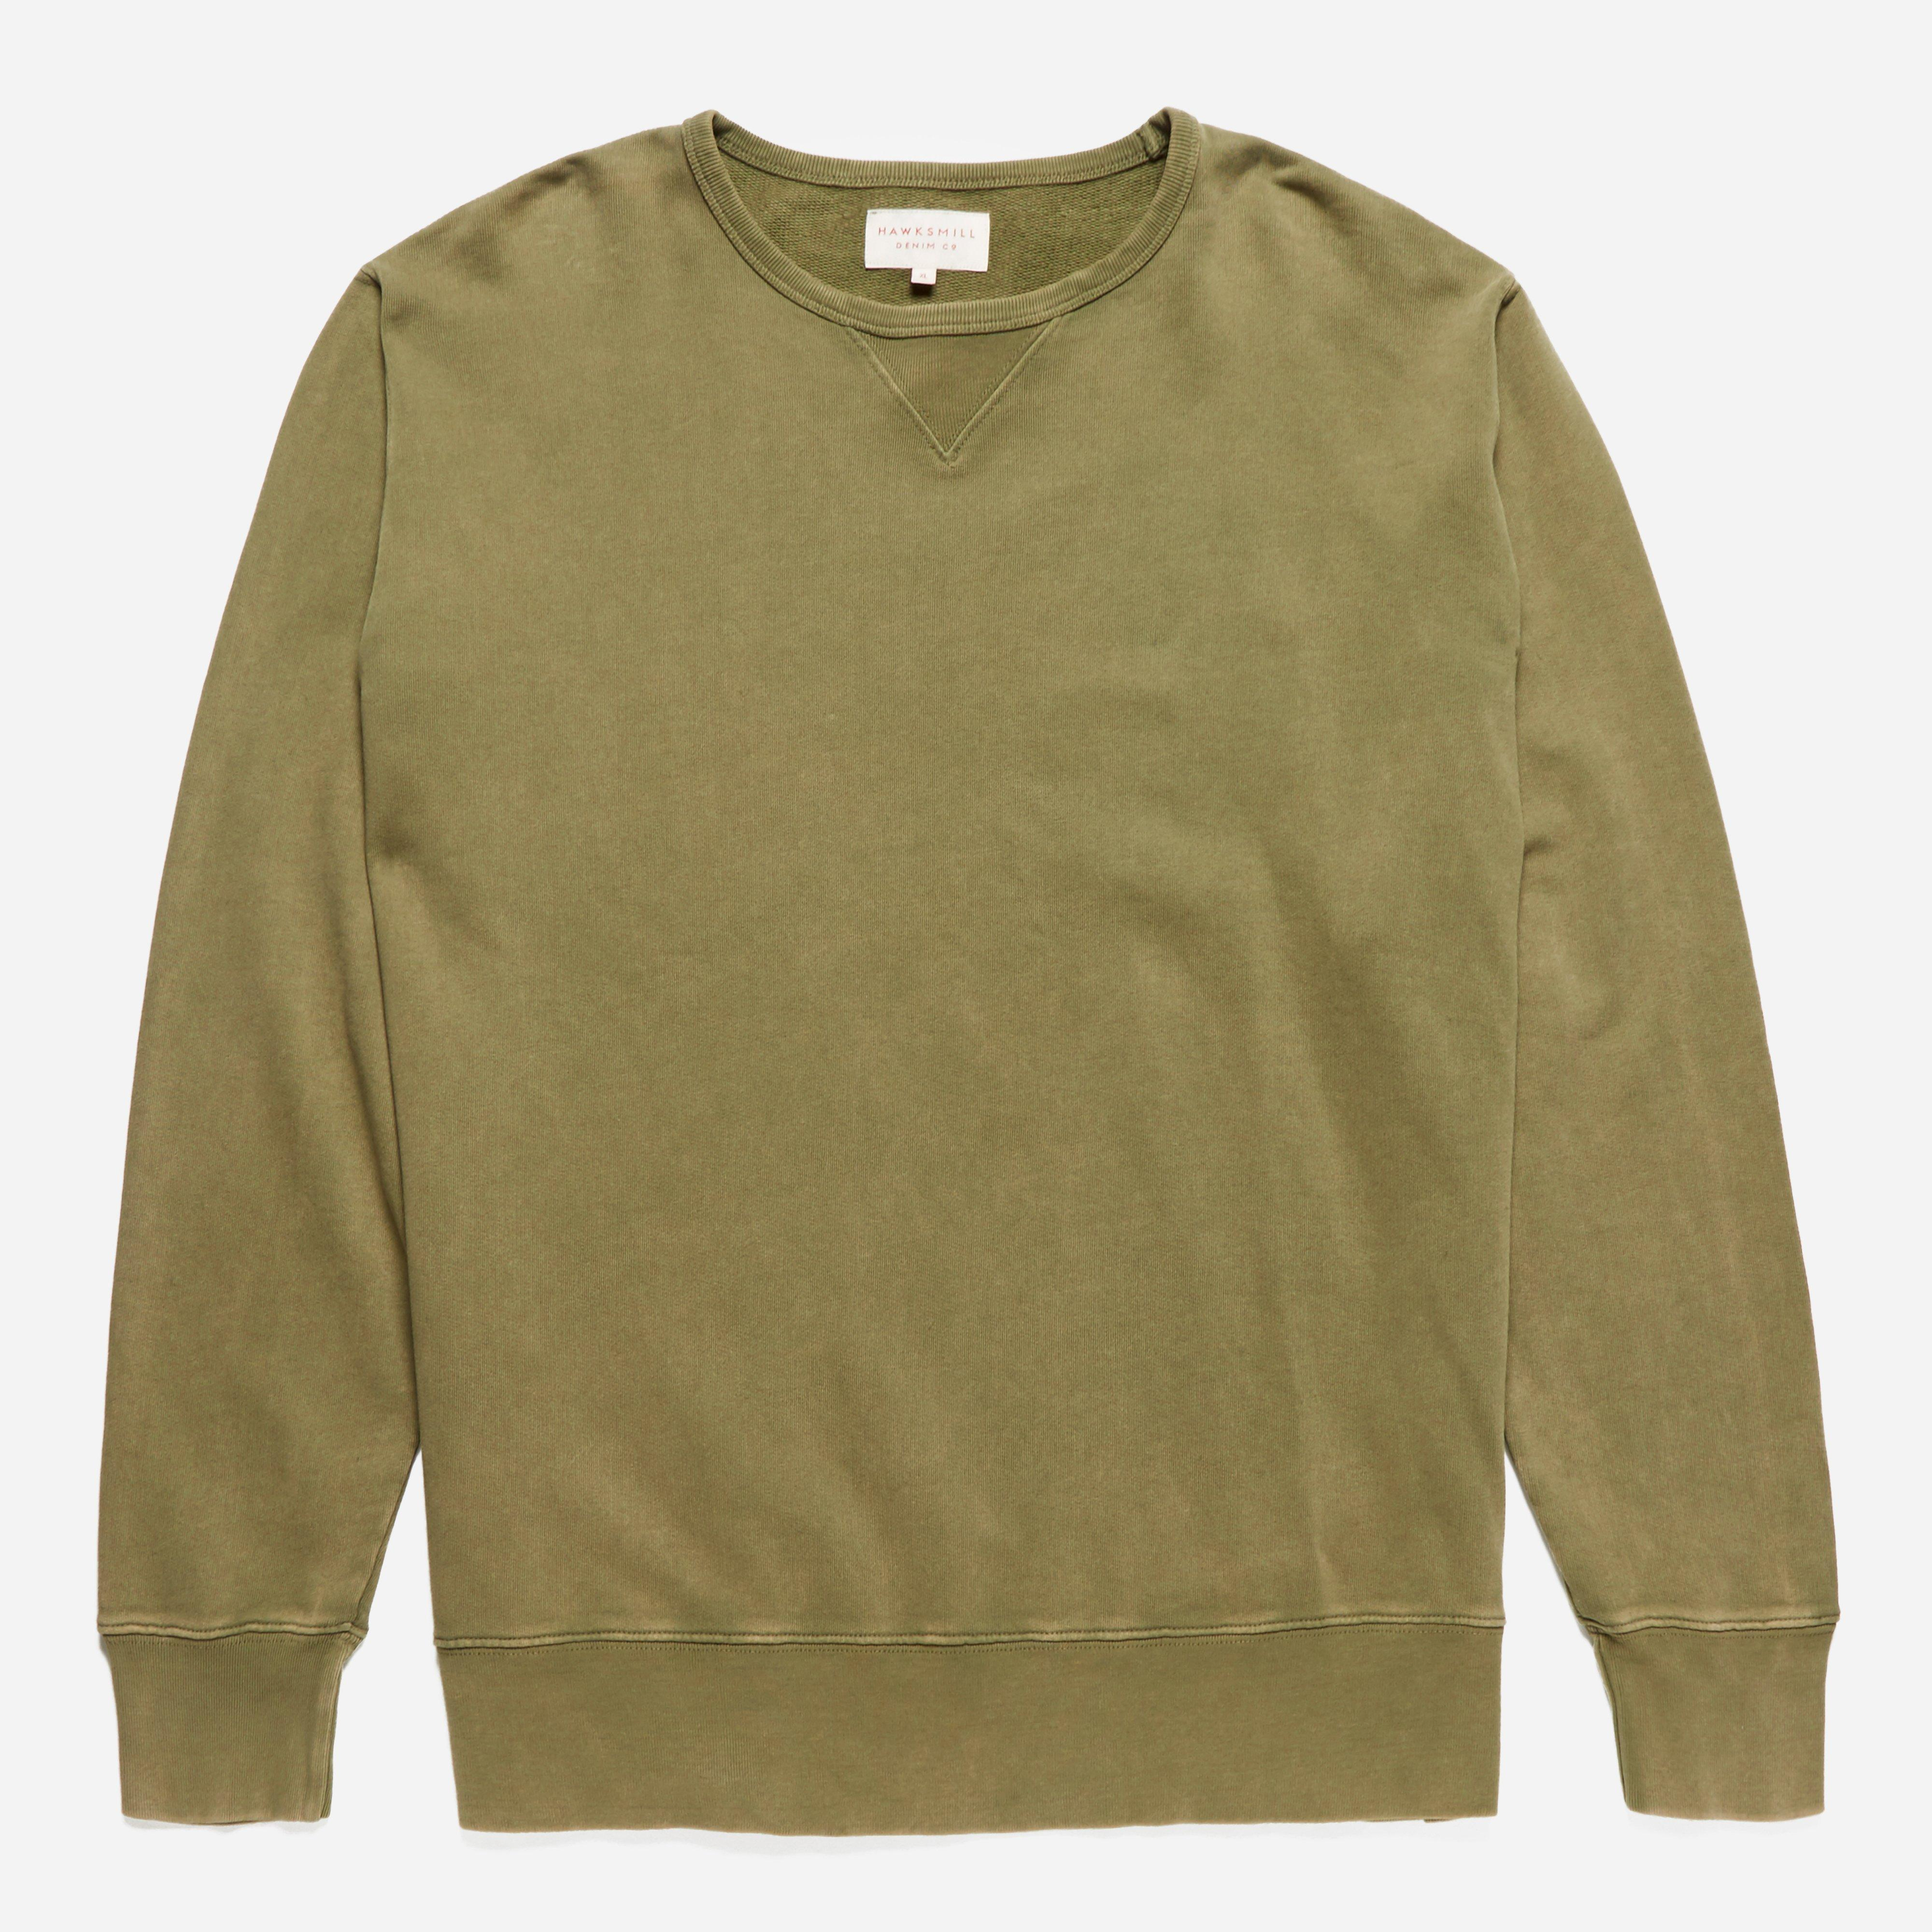 Hawksmill Denim Co. Garment Dyed Sweatshirt